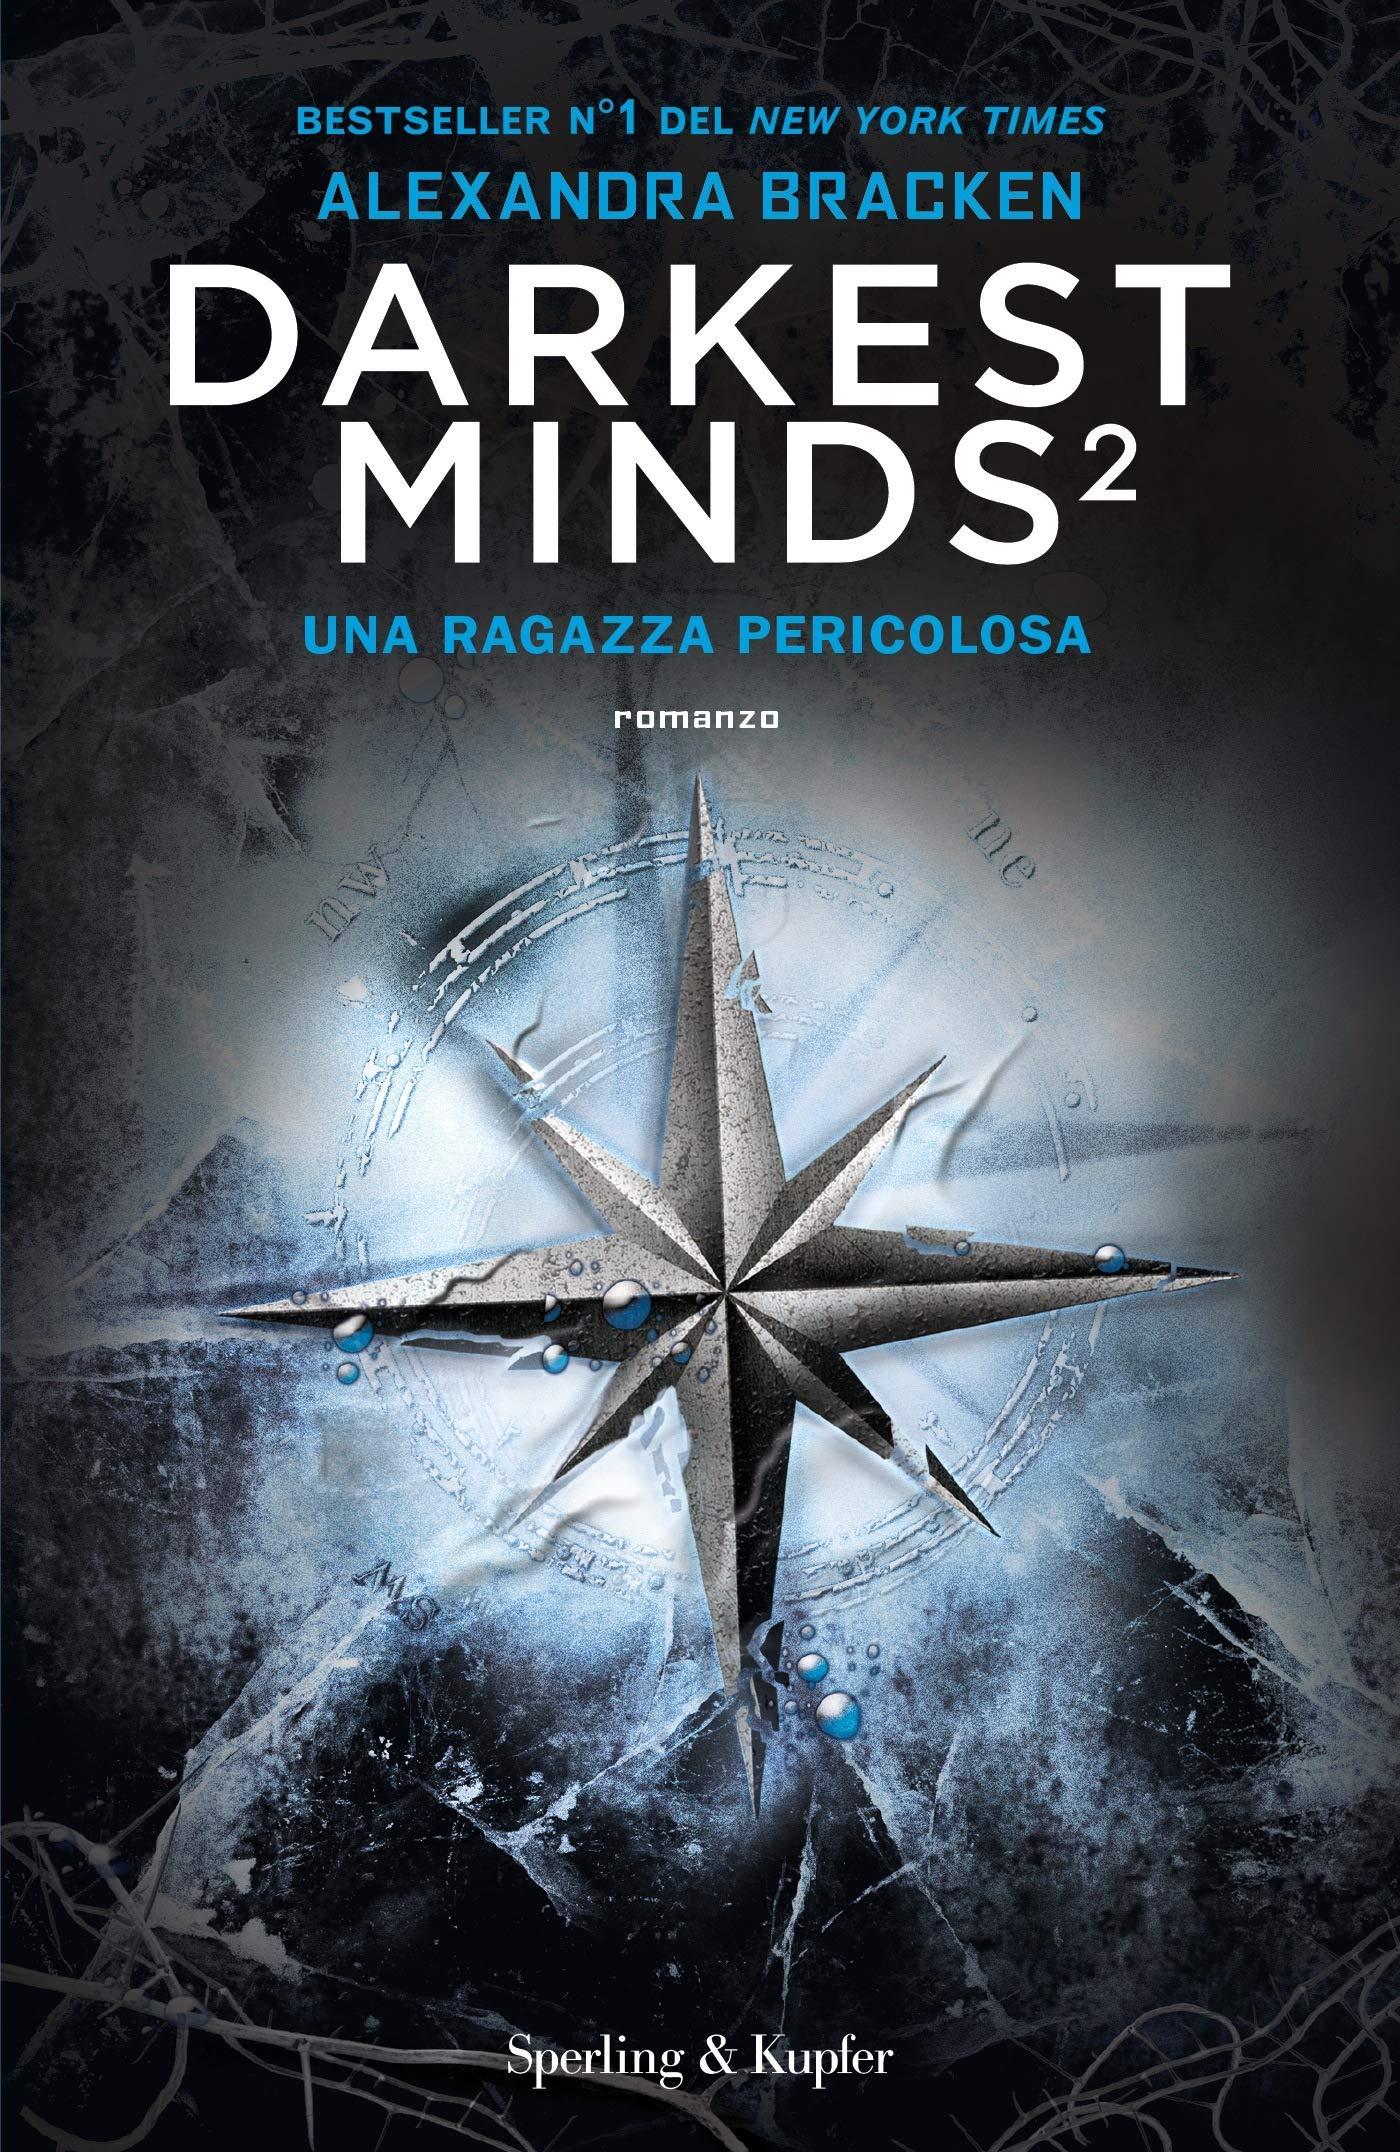 Darkest Minds 2. Una ragazza pericolosa – Alexandra Bracken